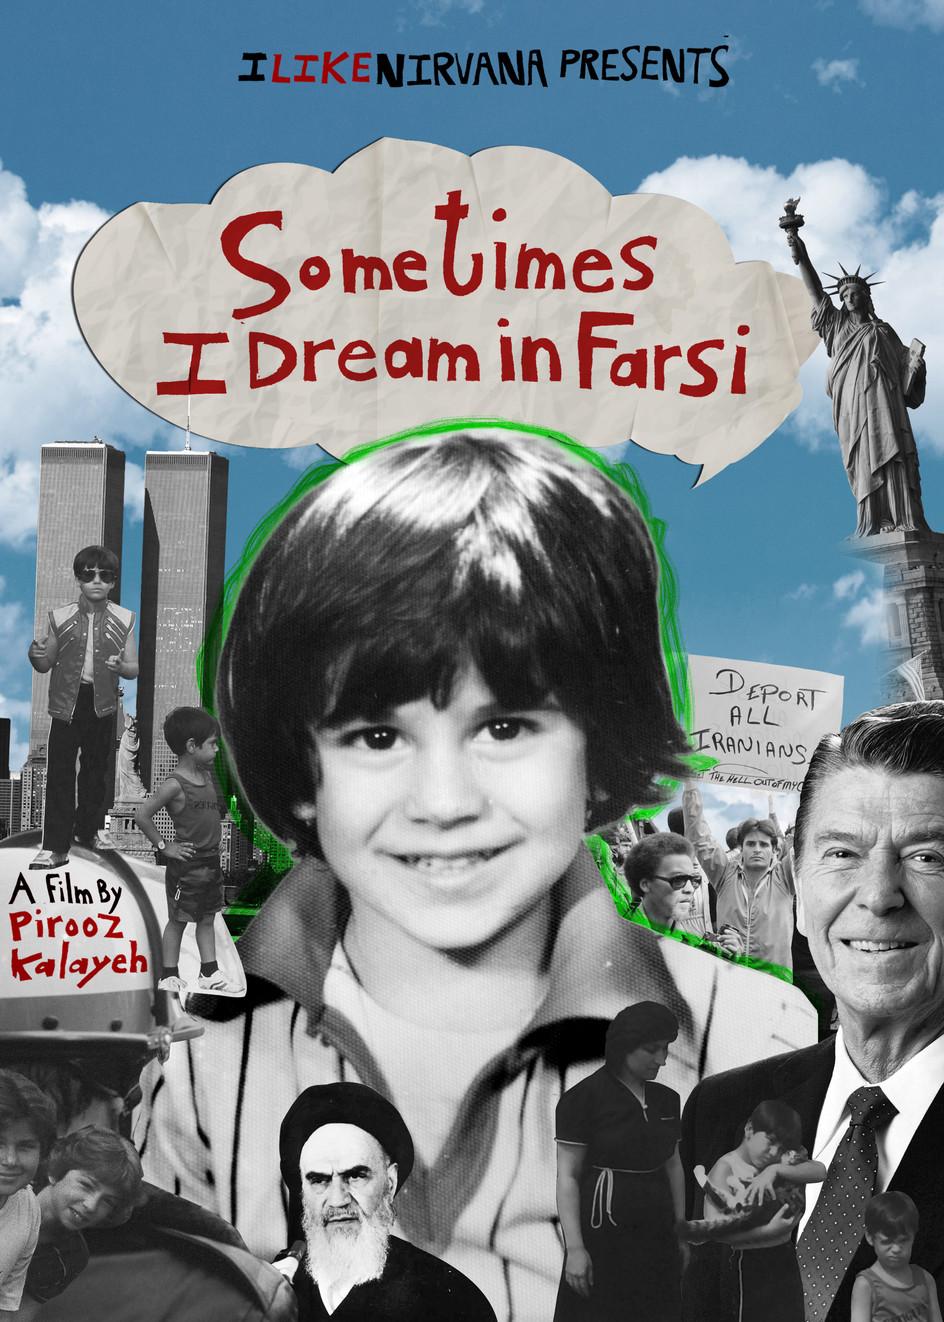 Sometimes I Dream in Farsi: The Story